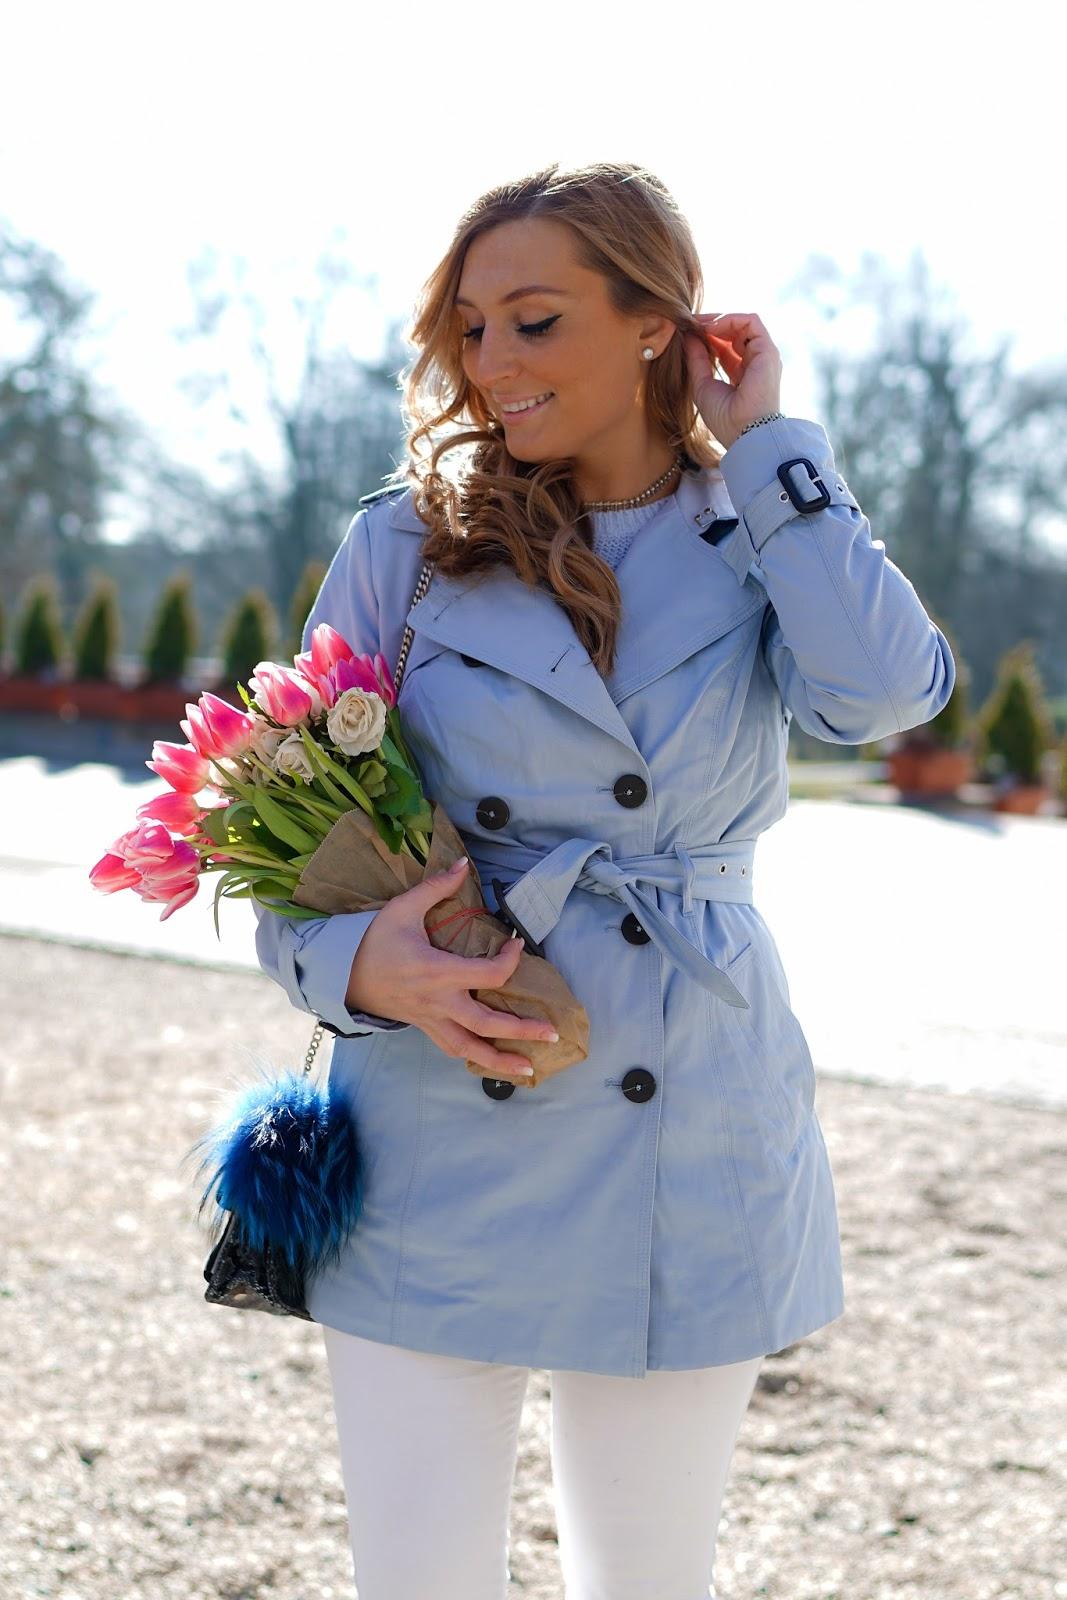 blauer-Pastellfarbener-Trenchcoat-Frühlingslook-Blogger-Trend-Trendjacke-was-ist-aktuell-angesagt-trenchcoat-fashionstylebyjohanna-blogger-aus-frankfurt